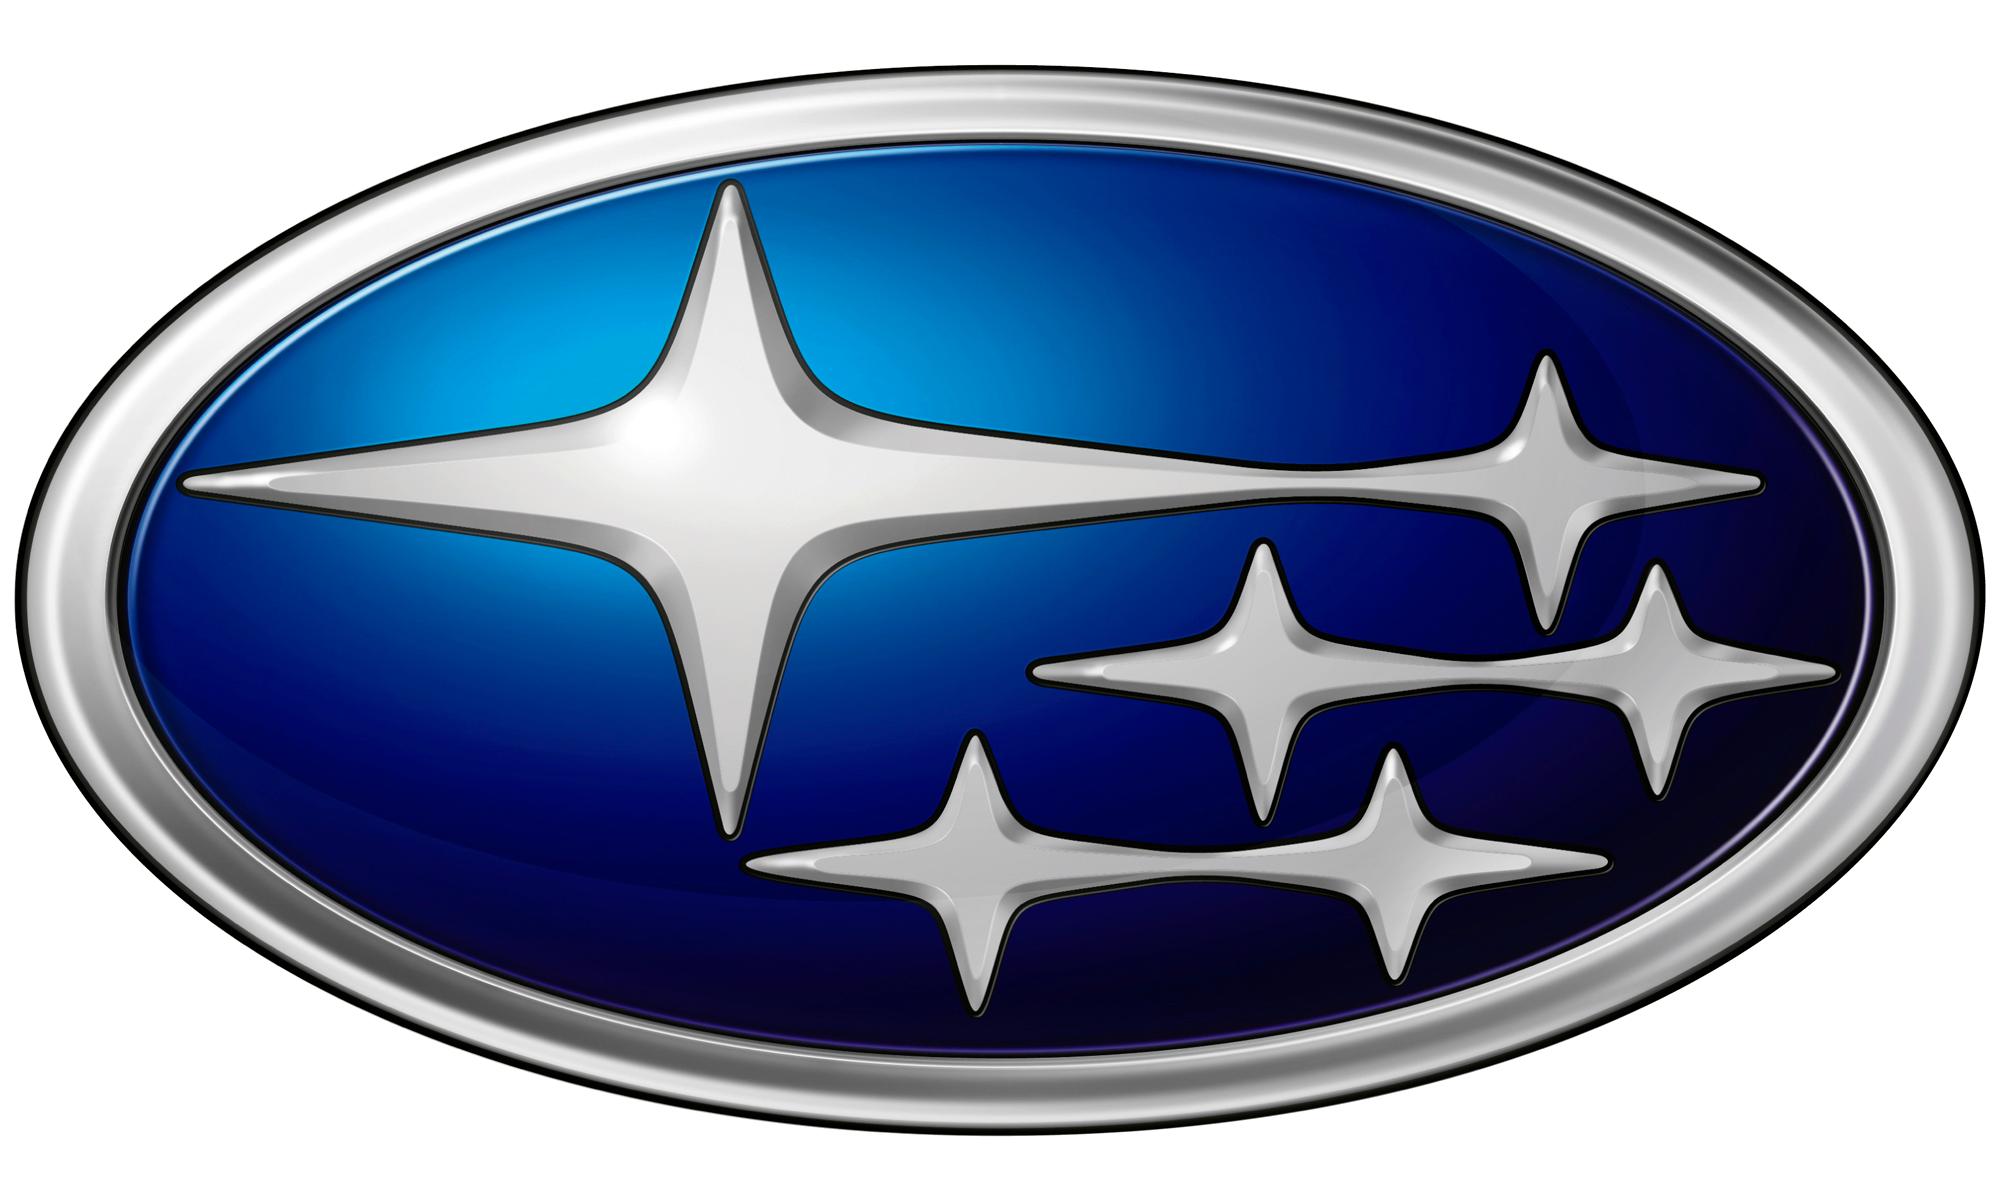 BMW Official Website >> Subaru Logo, Subaru Car Symbol Meaning and History